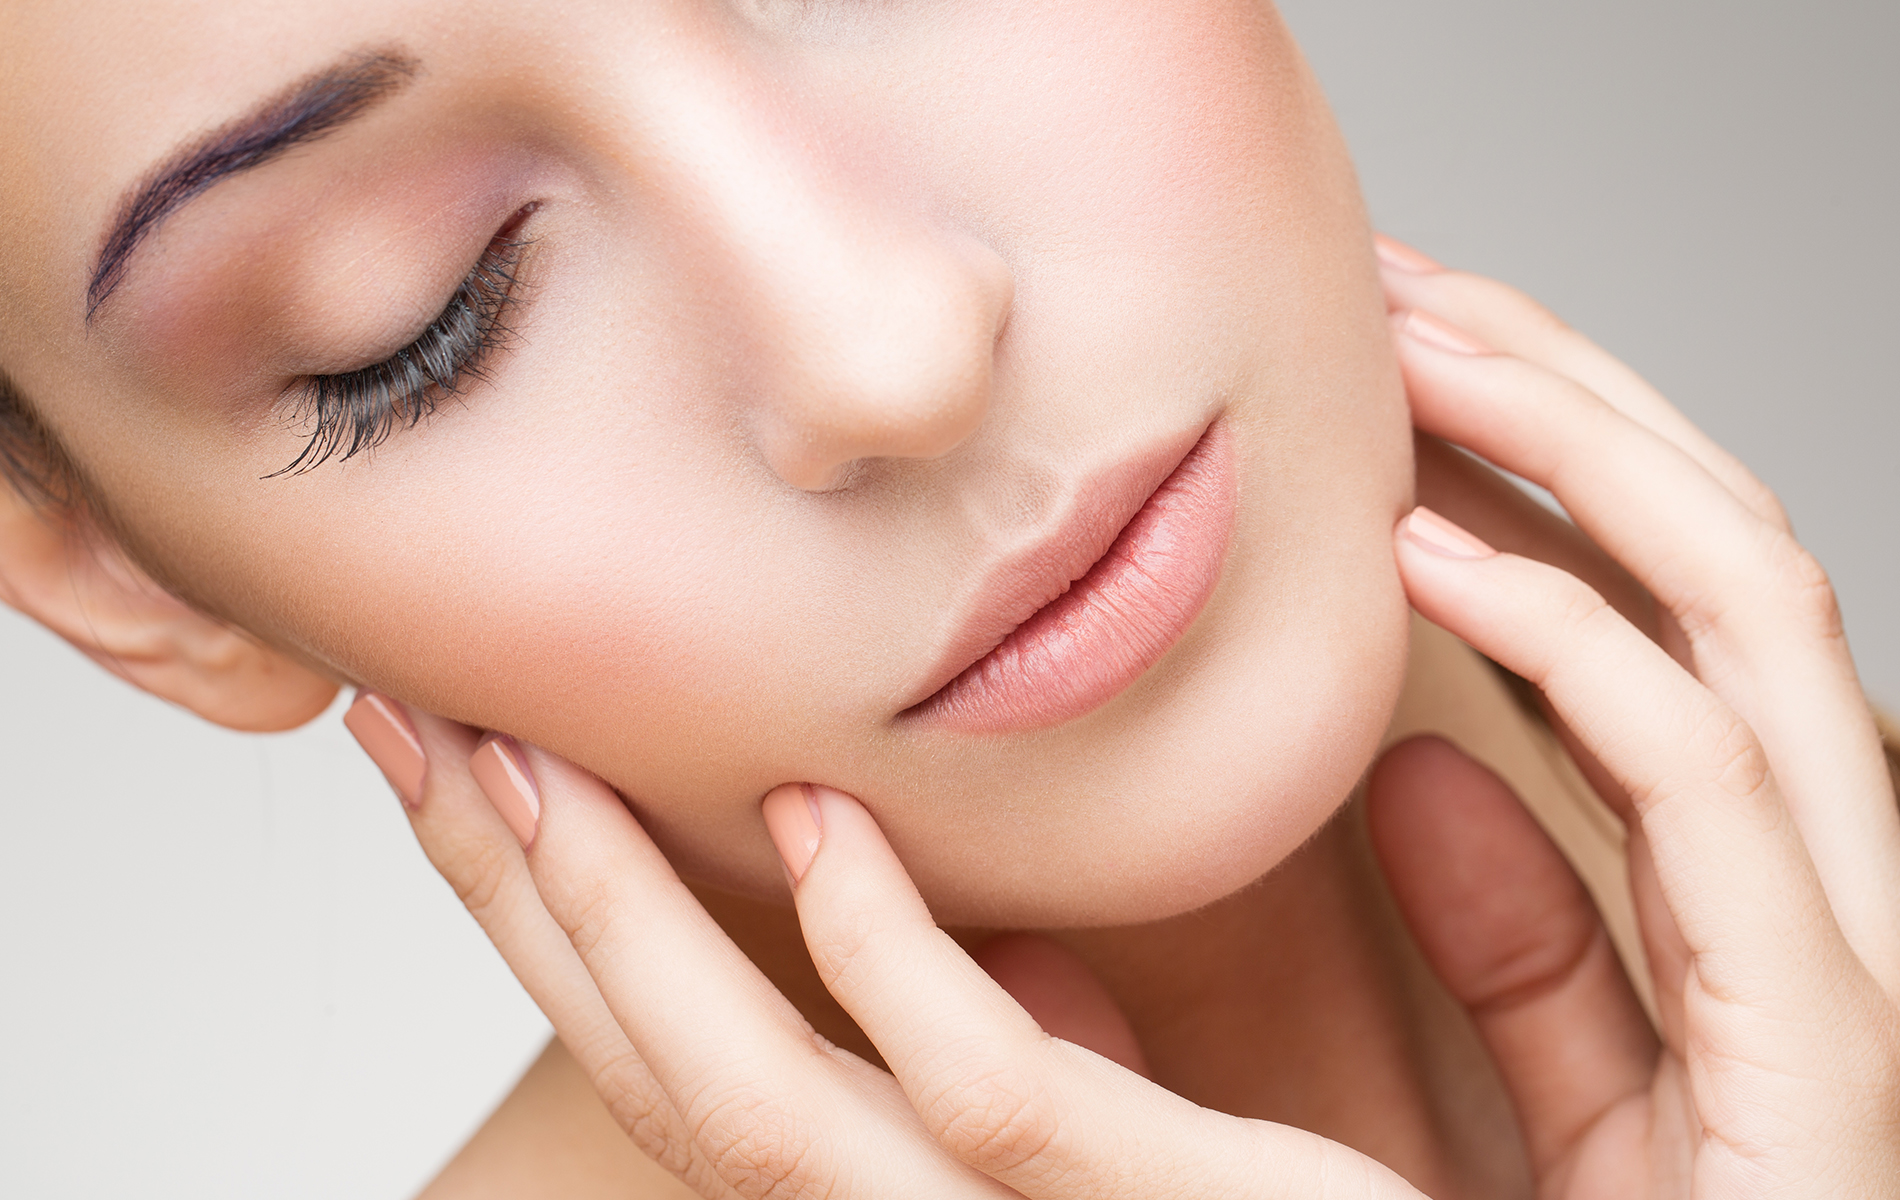 Nuz Shugaa Facials Facialist Skincare Beauty Face